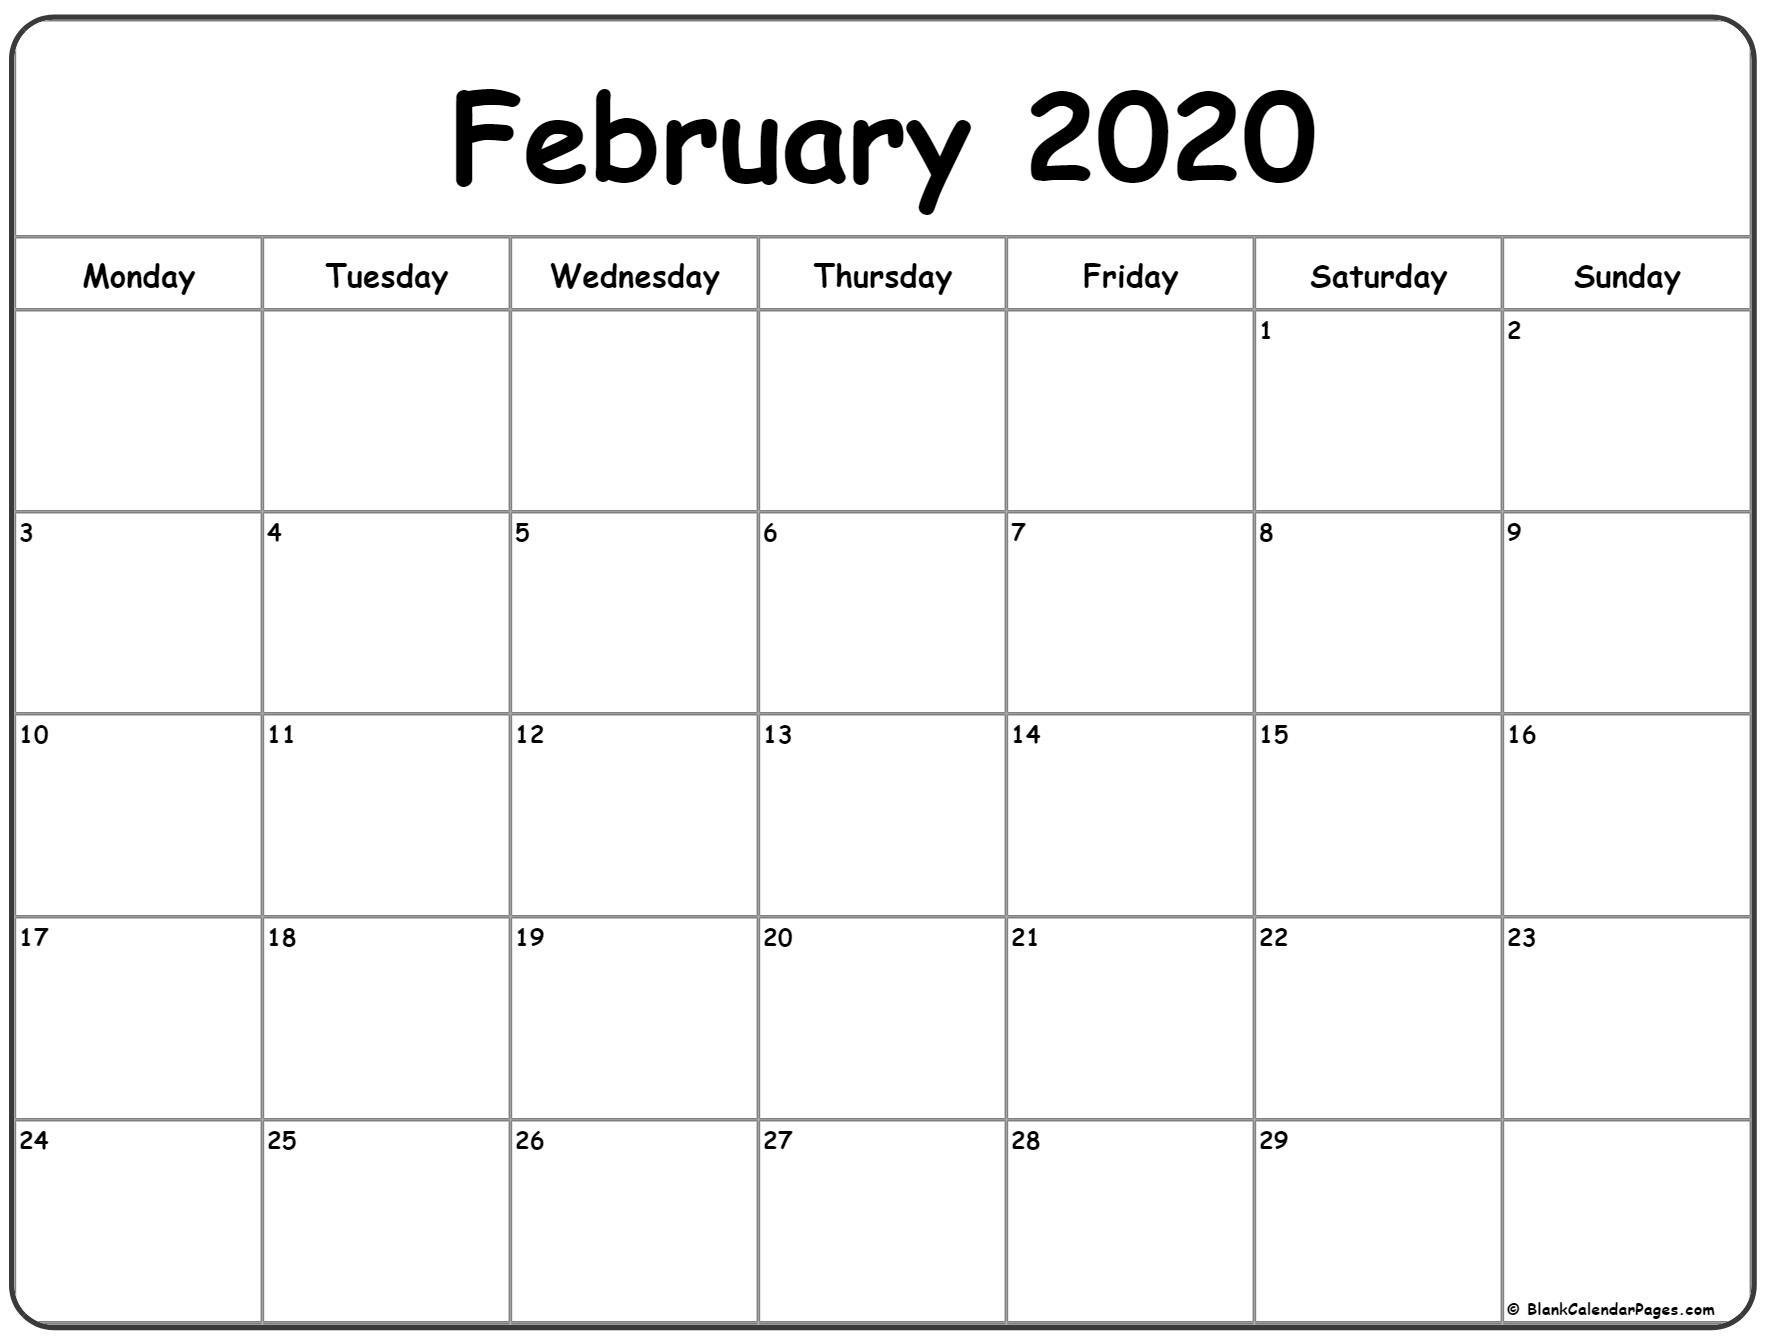 February 2020 Monday Calendar | Monday To Sunday regarding Monday To Sunday 2020 Calendar